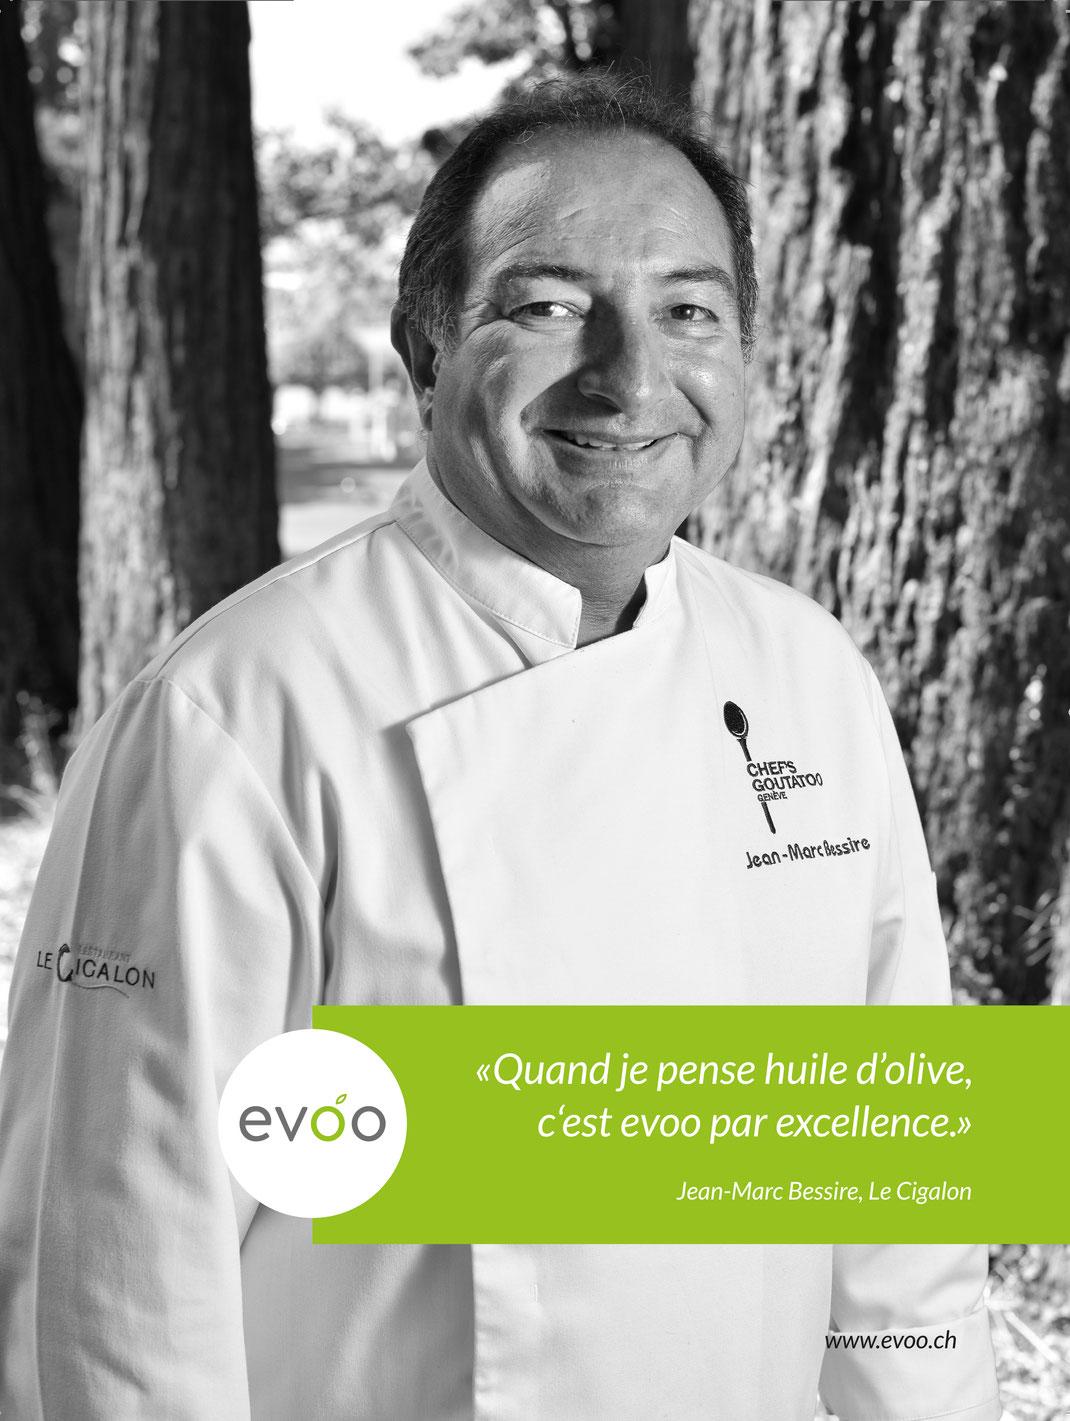 Jean-Marc Bessire - evoo Ambassador